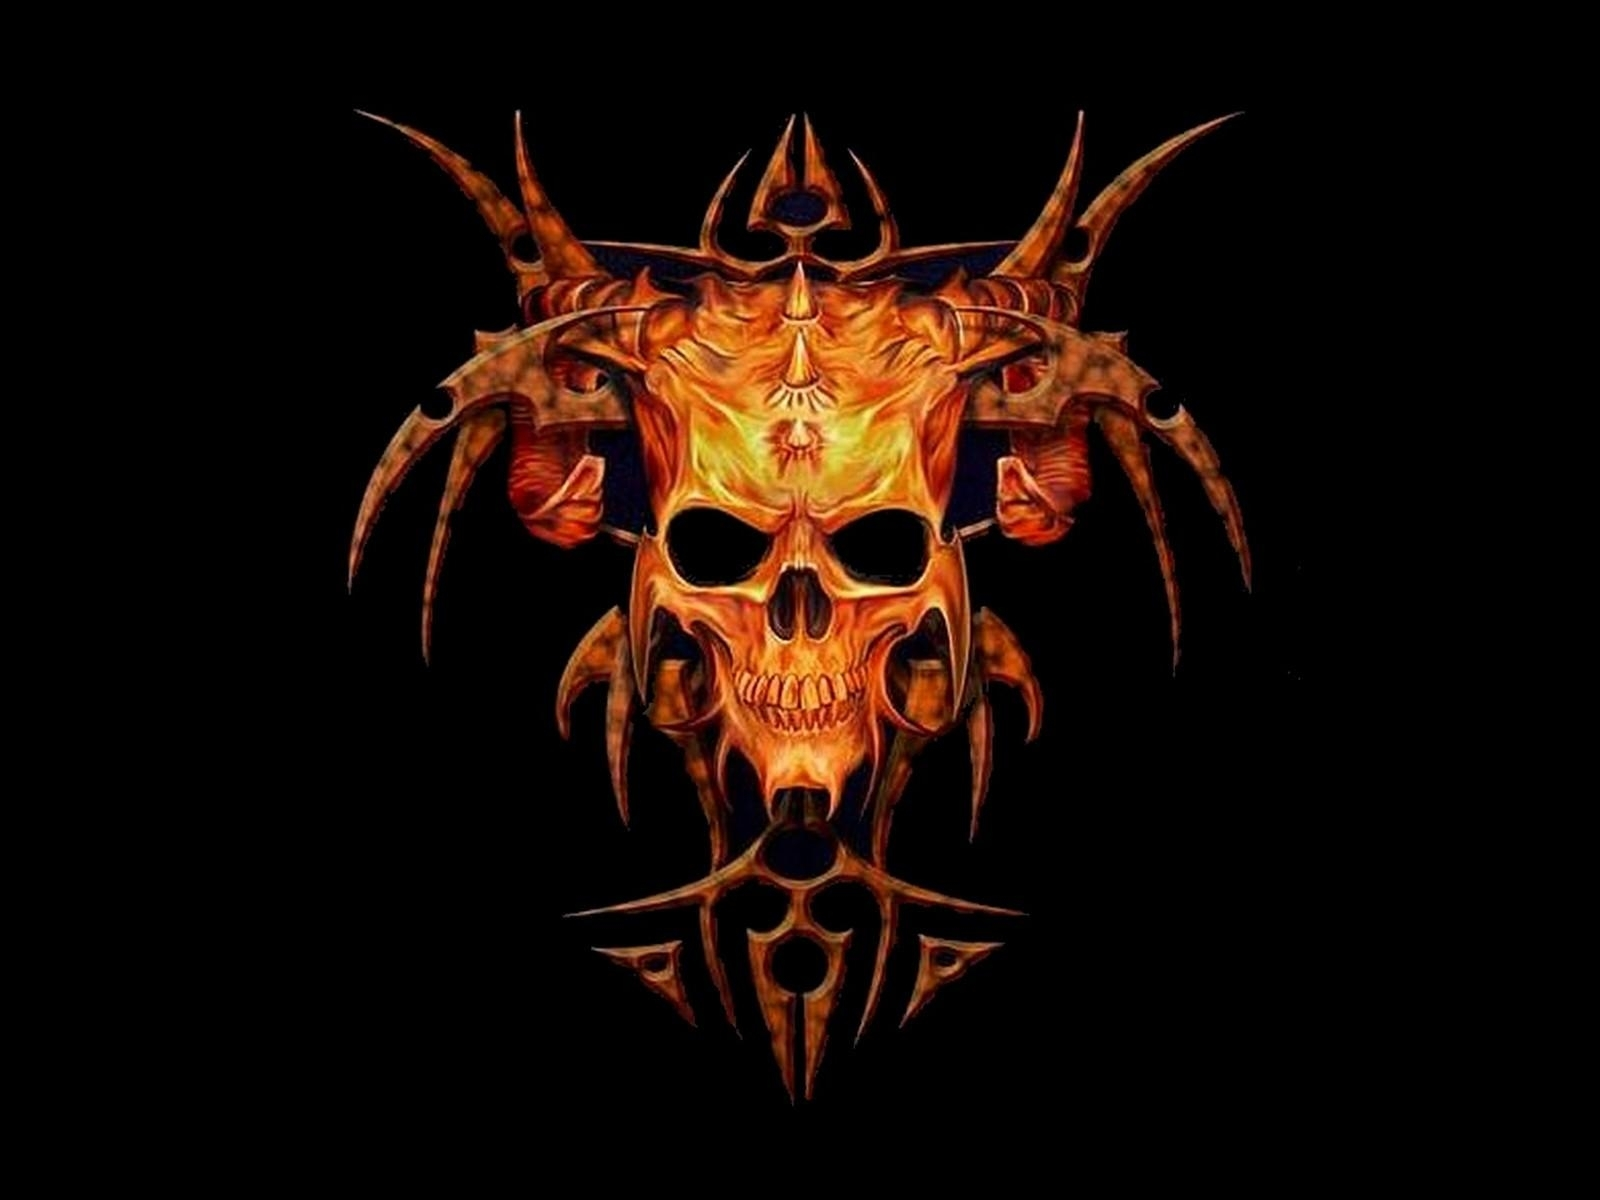 10 New Danger Skull Wallpapers Free Download FULL HD 1920 ...